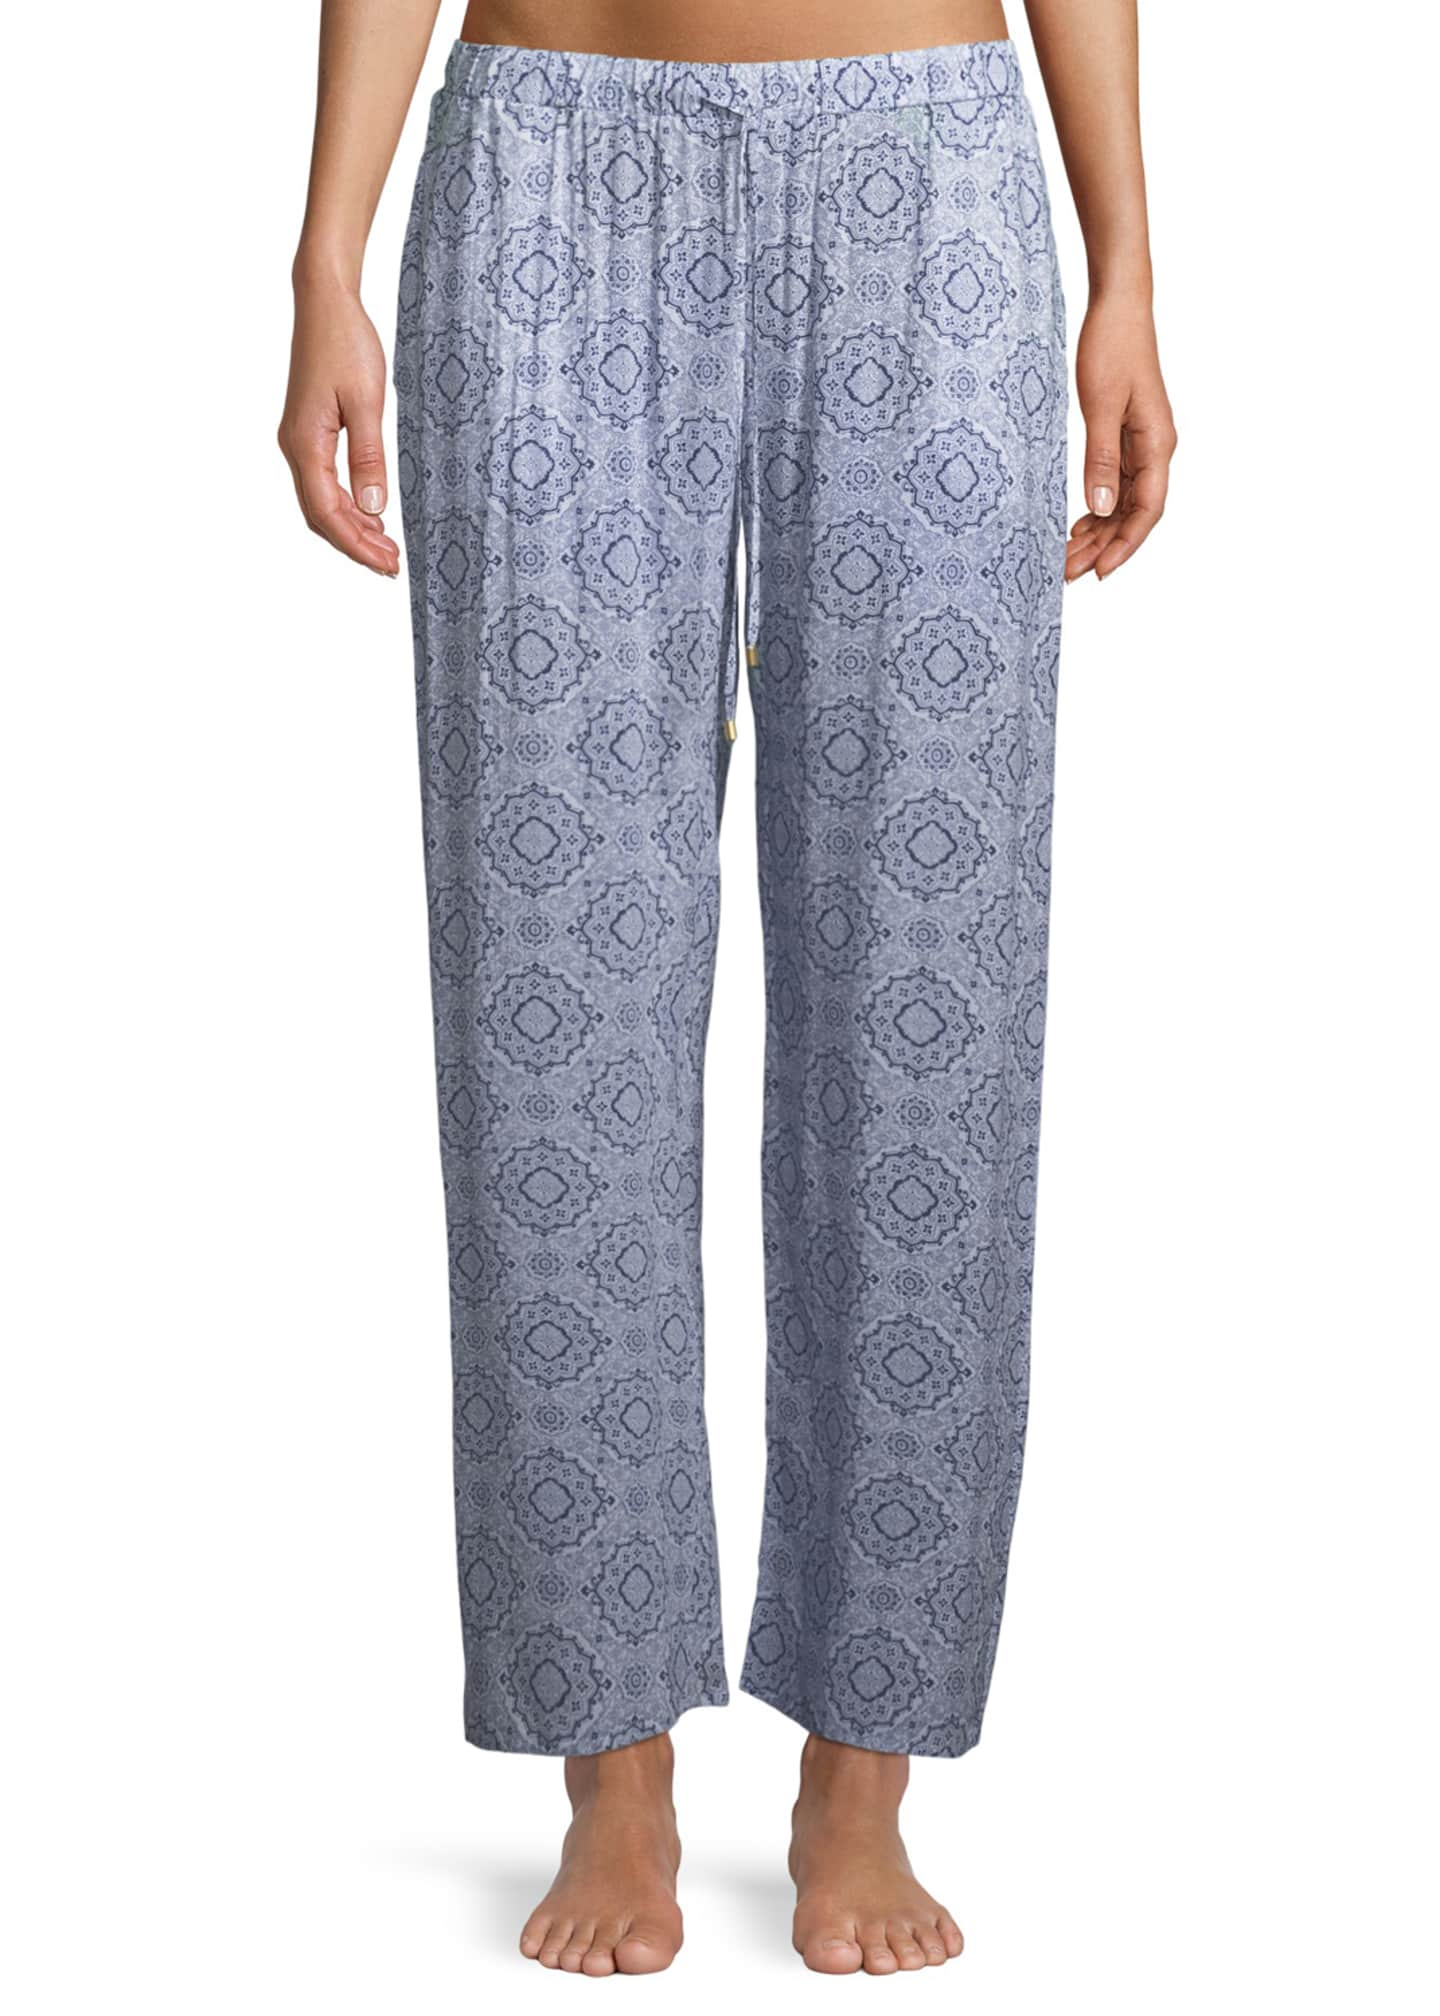 Hanro Medallion Pattern Lounge Pants